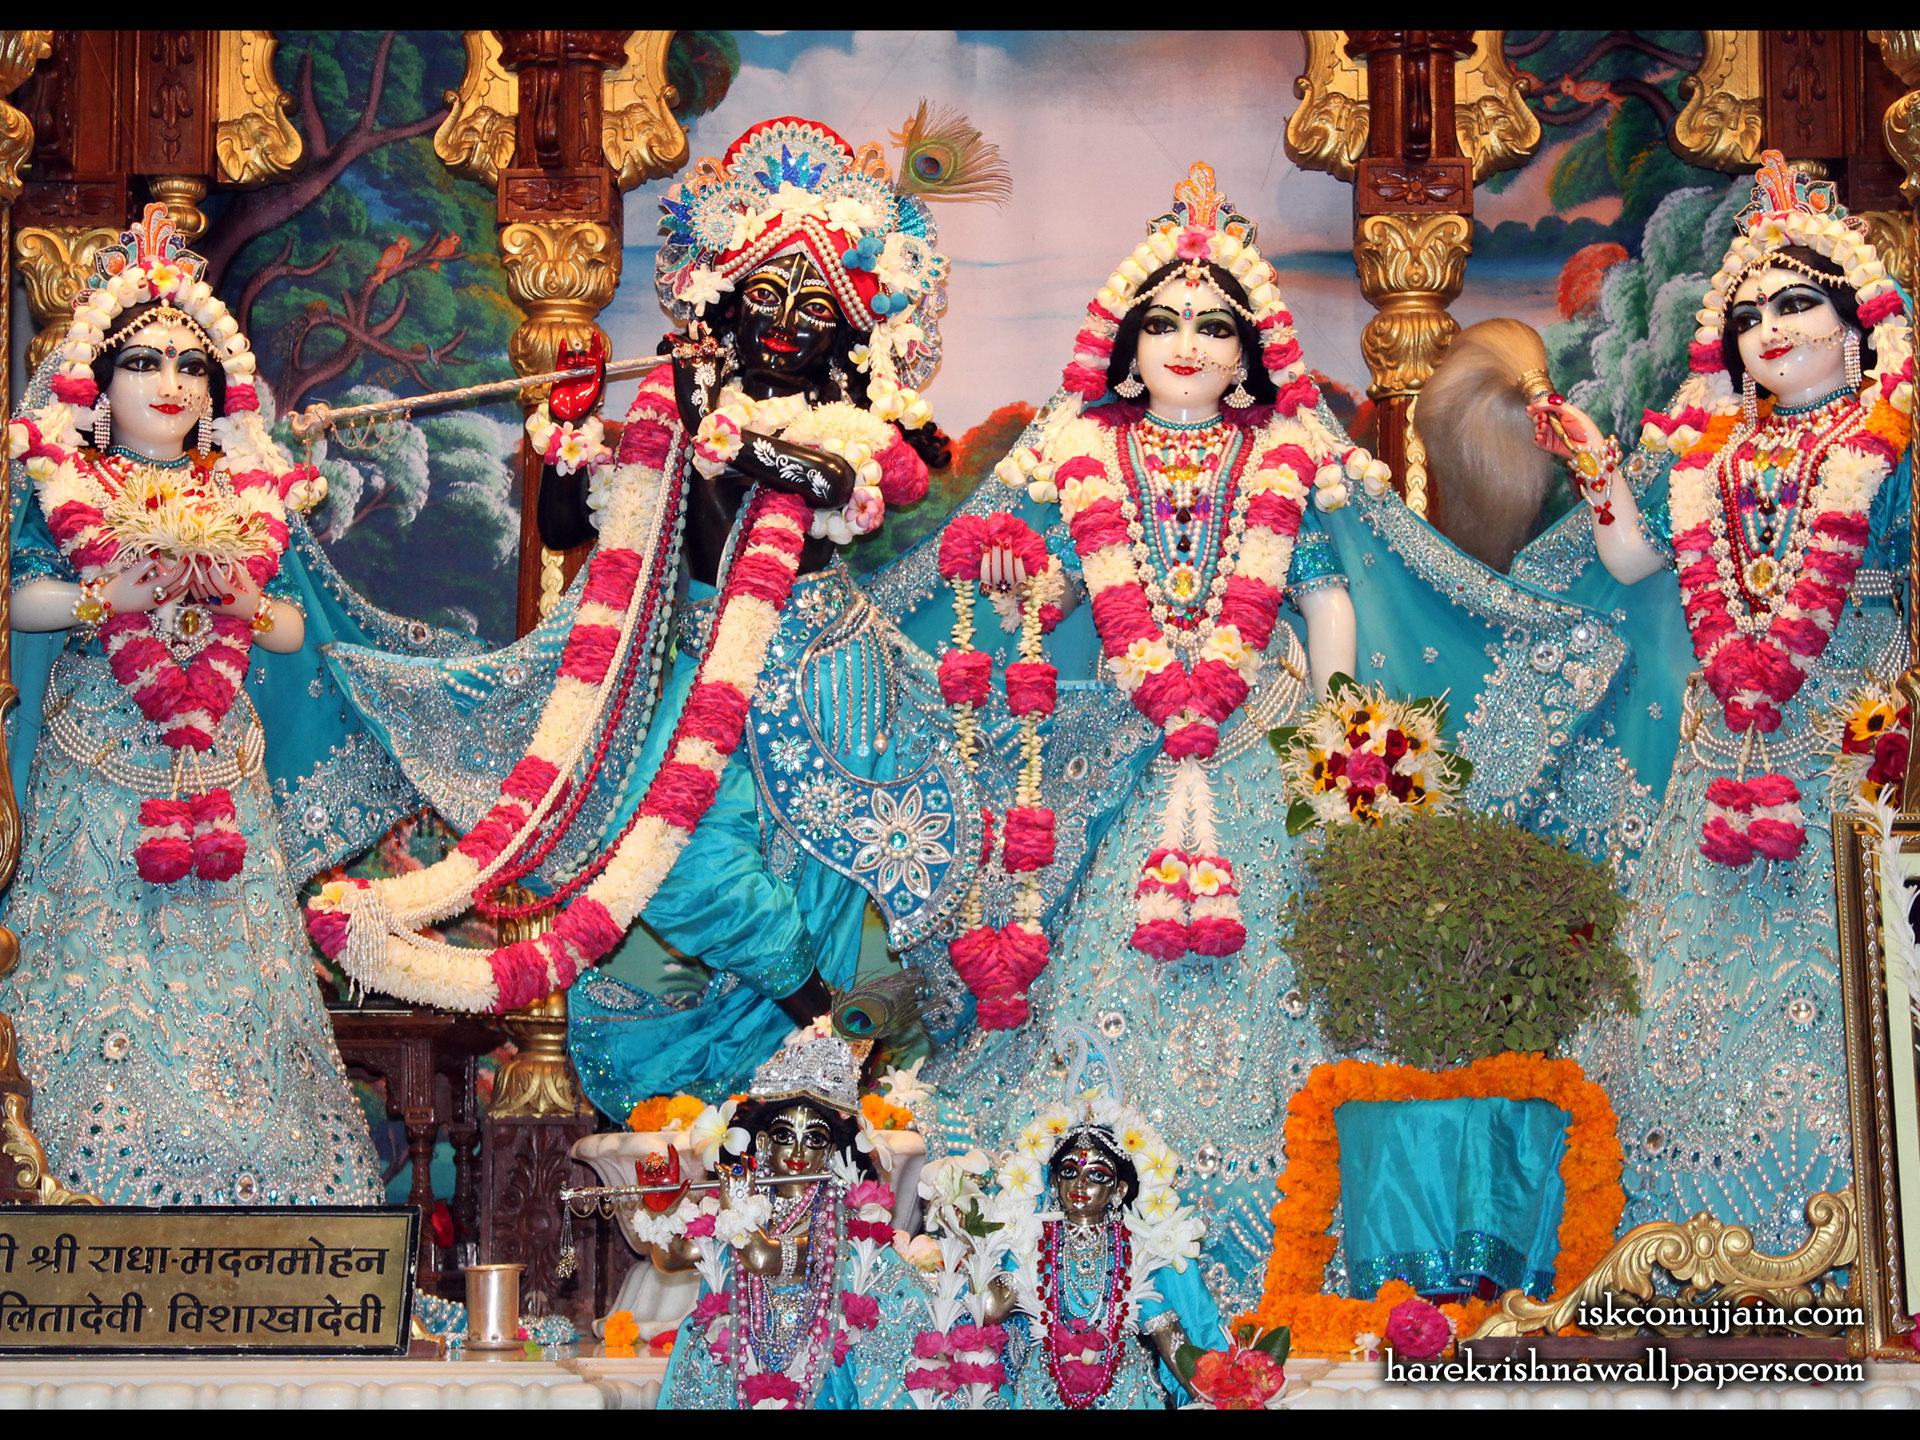 Sri Sri Radha Madanmohan Lalita Vishakha Wallpaper (006) Size 1920x1440 Download